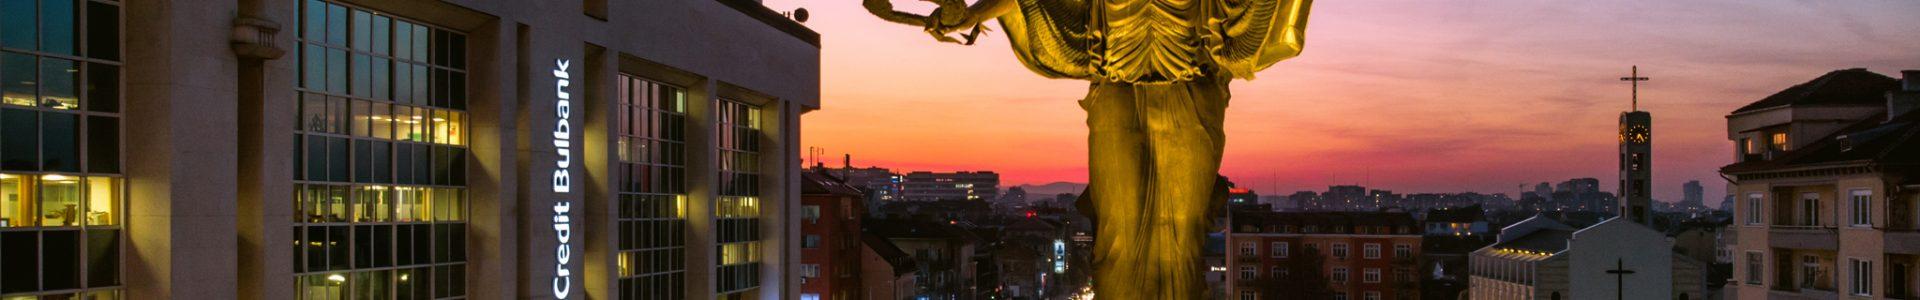 ETUDE: Sofia in blue hour